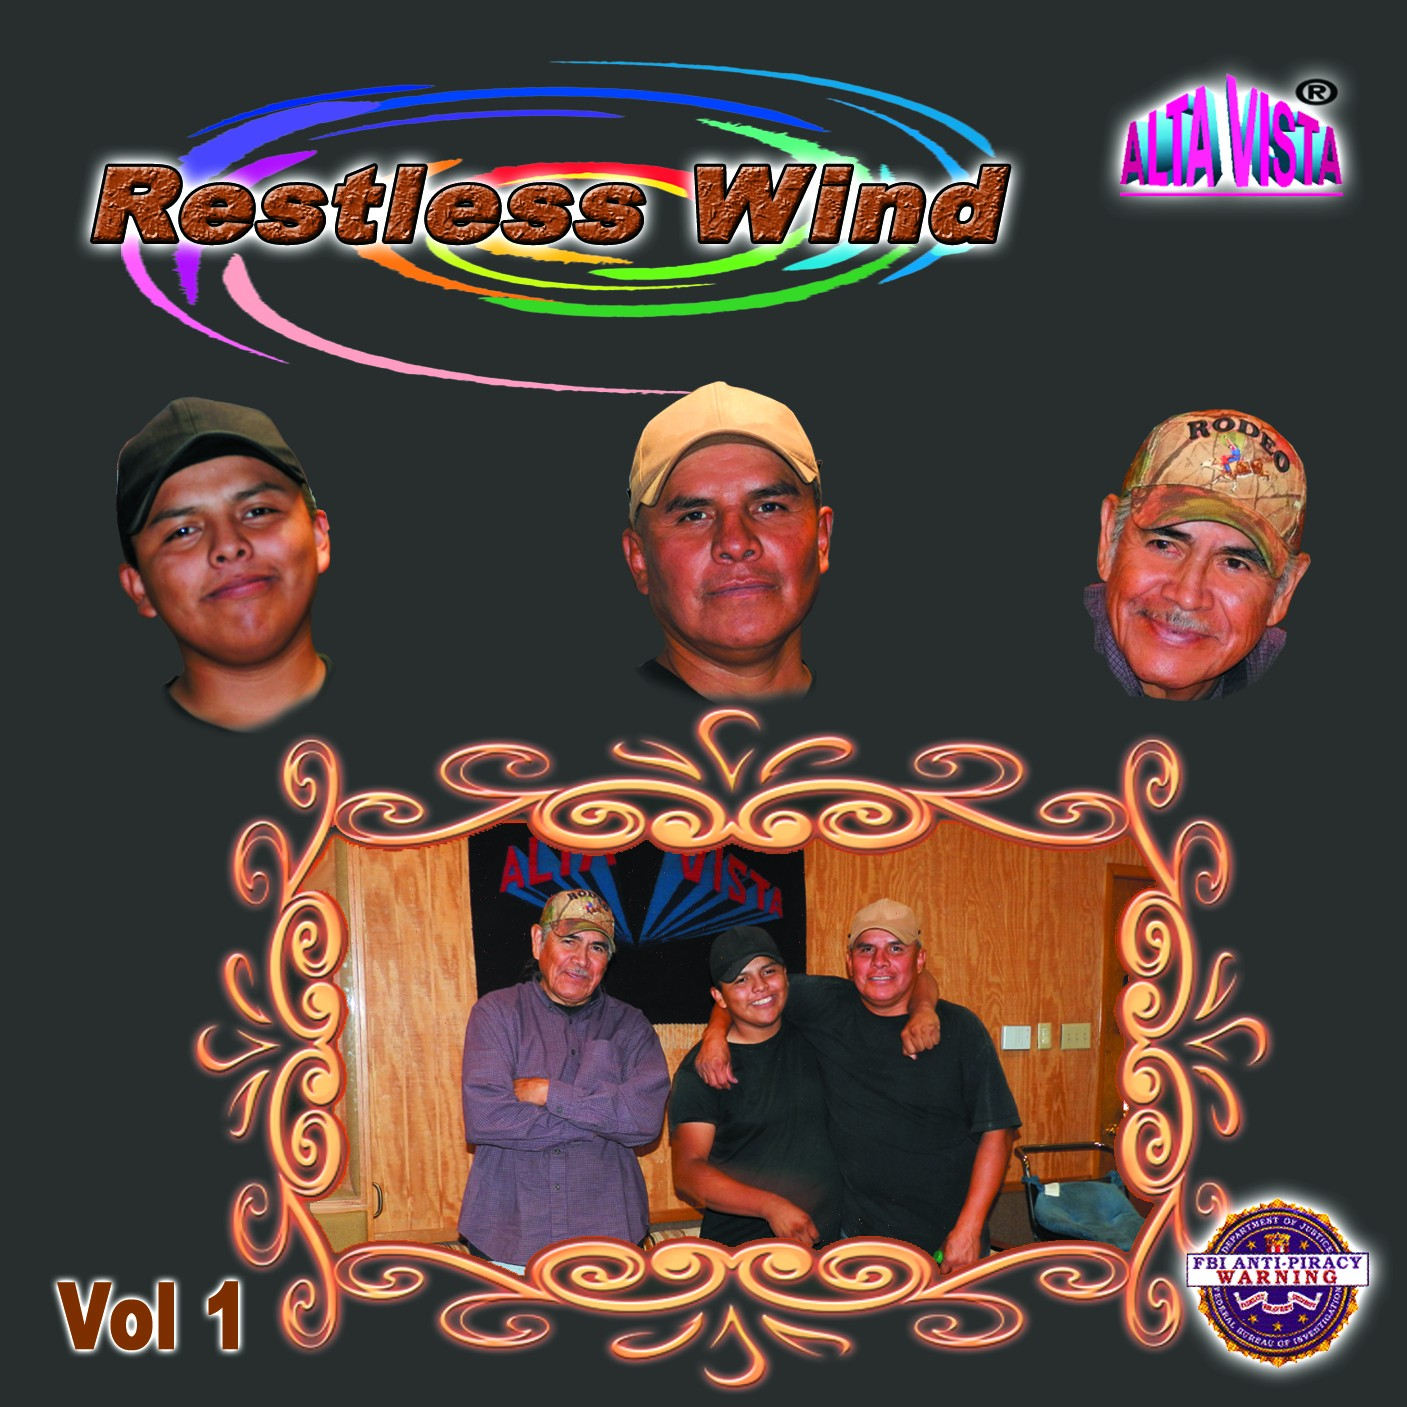 Restless Wind Vol 1 Downloadable Songs